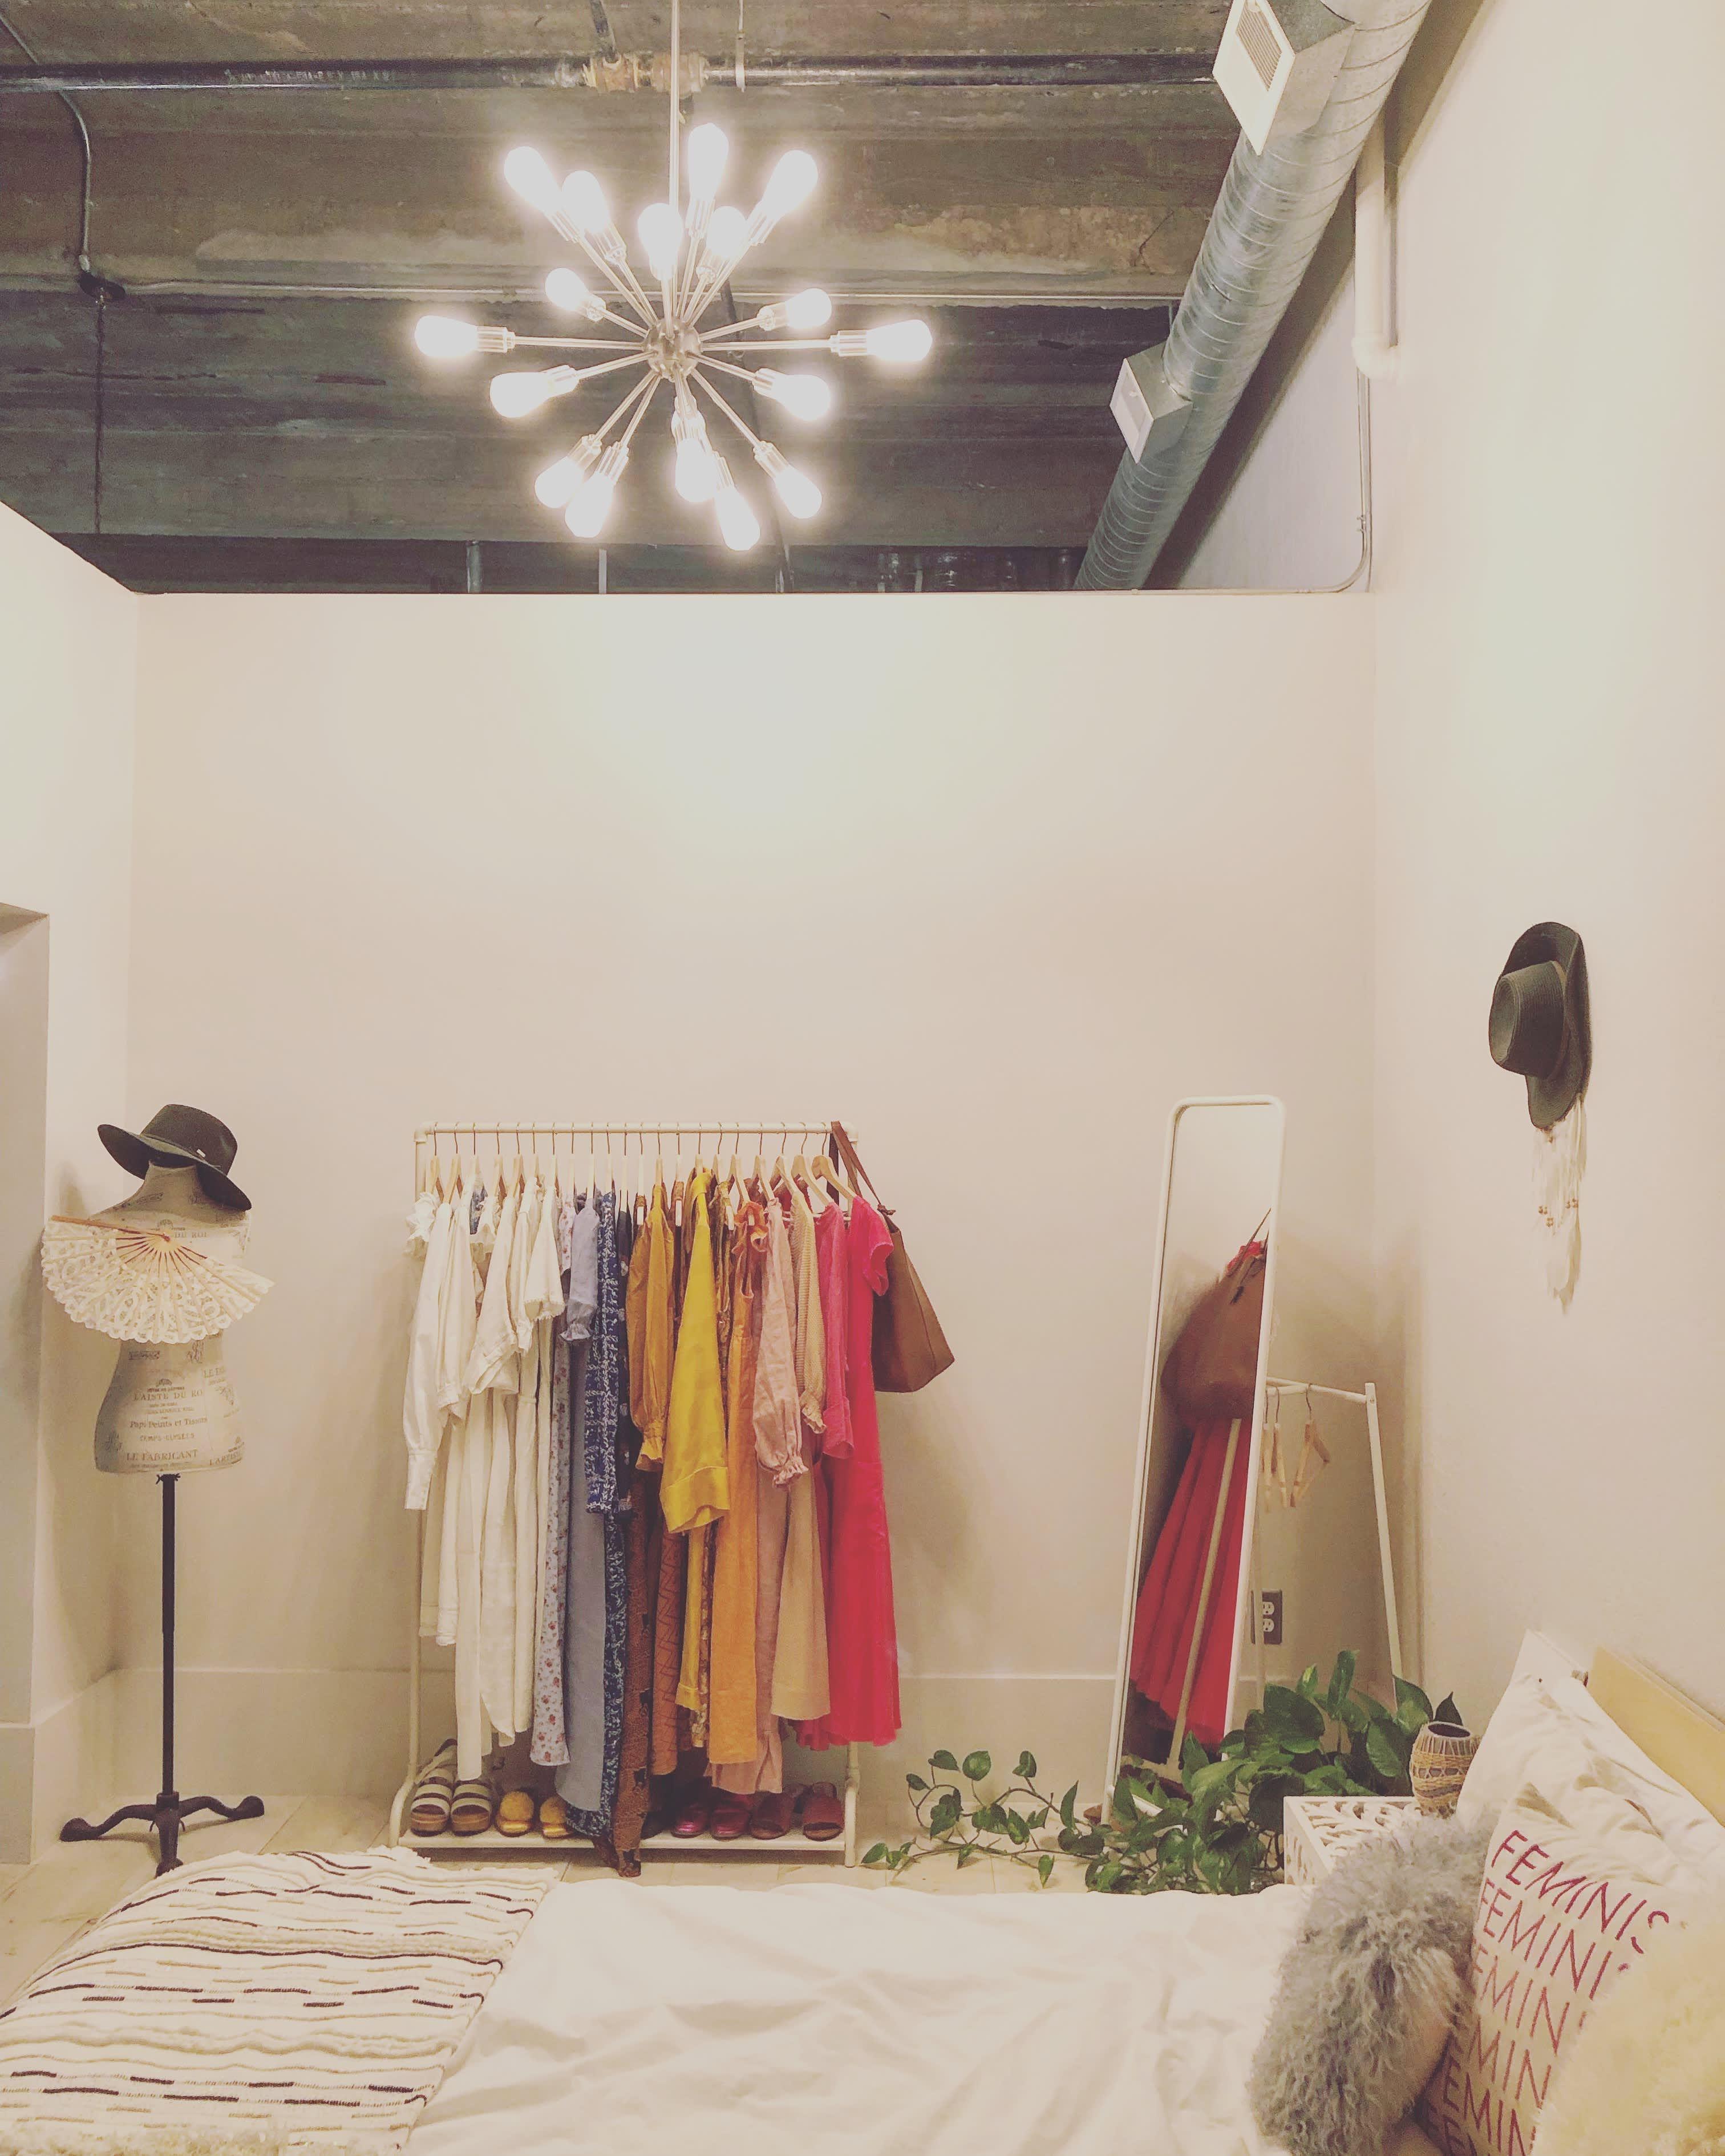 A Condo Found On Craigslist Is A Uniquely Magical Bright Dream Rental Apartment Decor Rental Decorating Room Decor